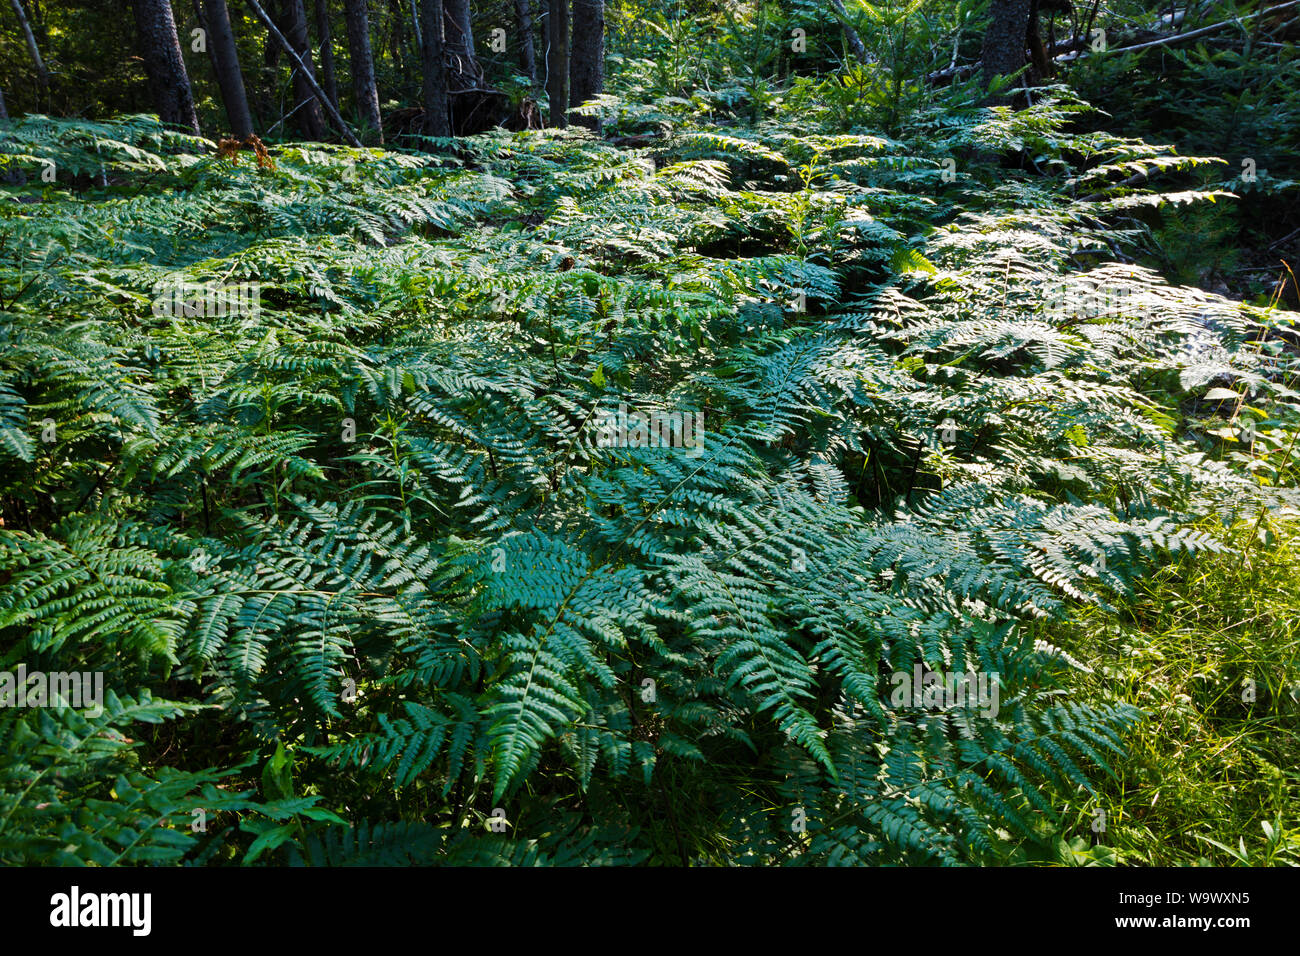 Helechos silvestres son el sotobosque de un bosque - Blue Hill, Maine Foto de stock